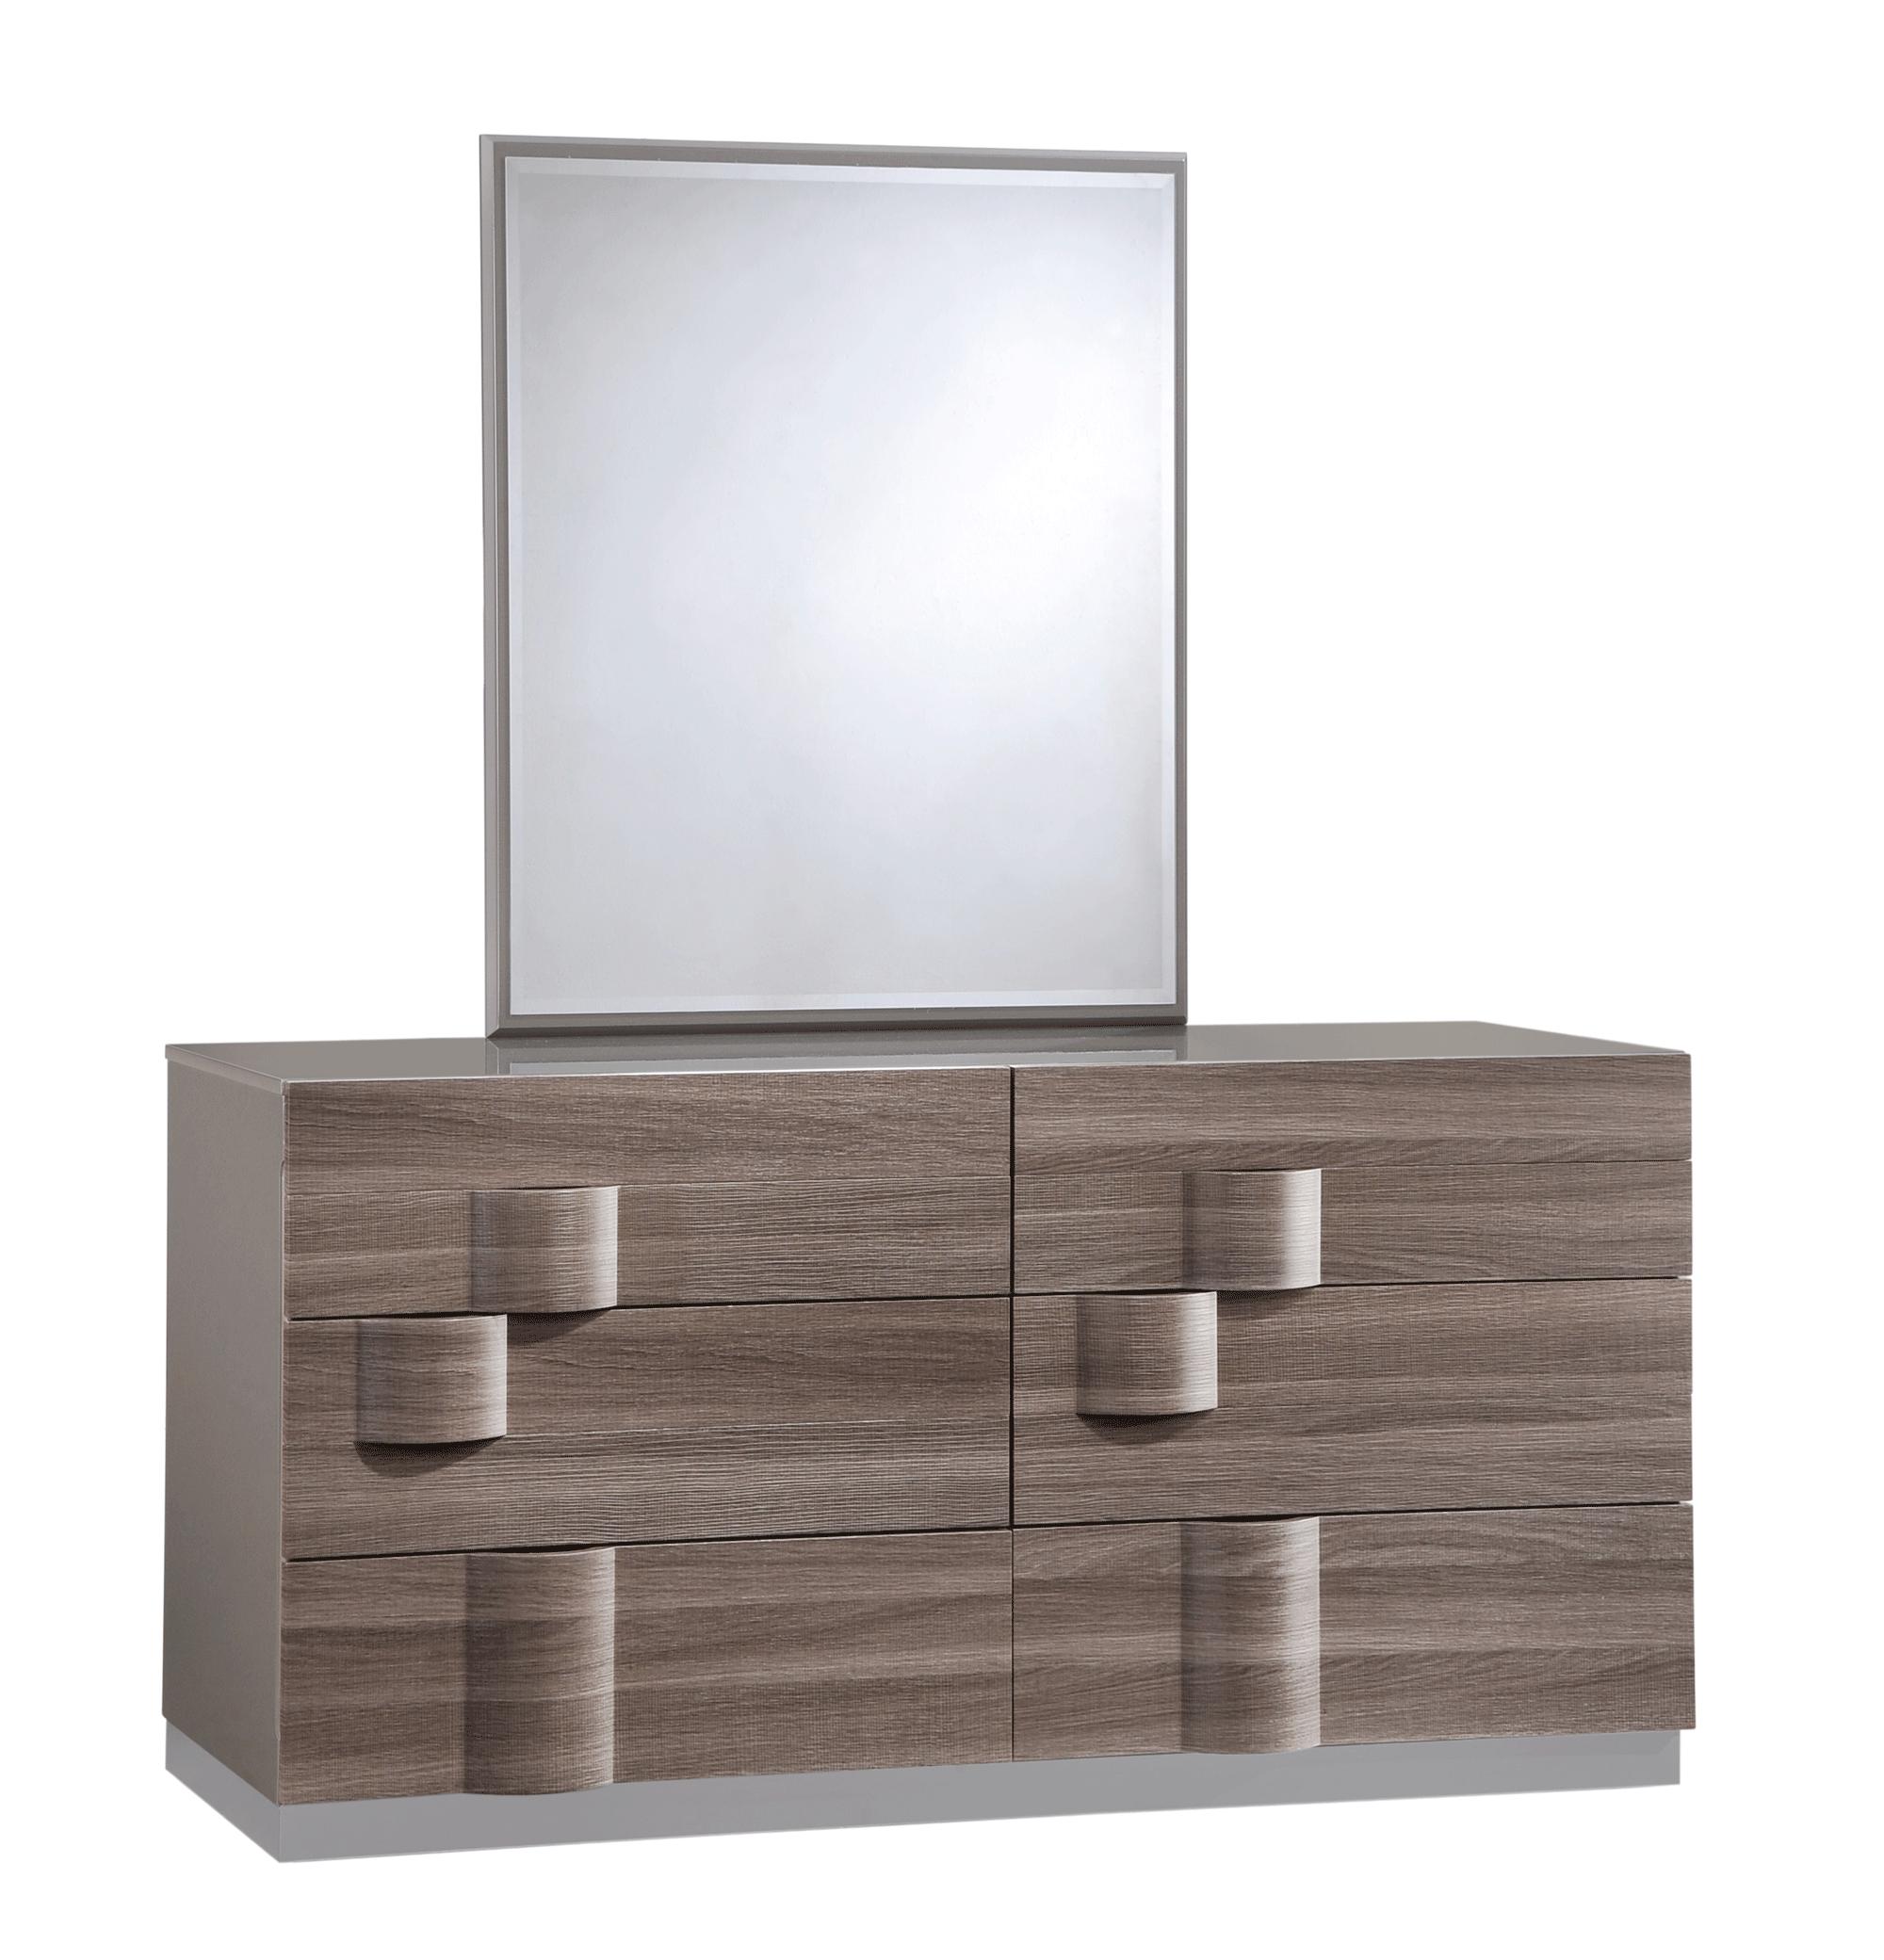 Global Bedroom Furniture Adel Grey Glossy Zebra Wood Bedroom Set By Global Furniture